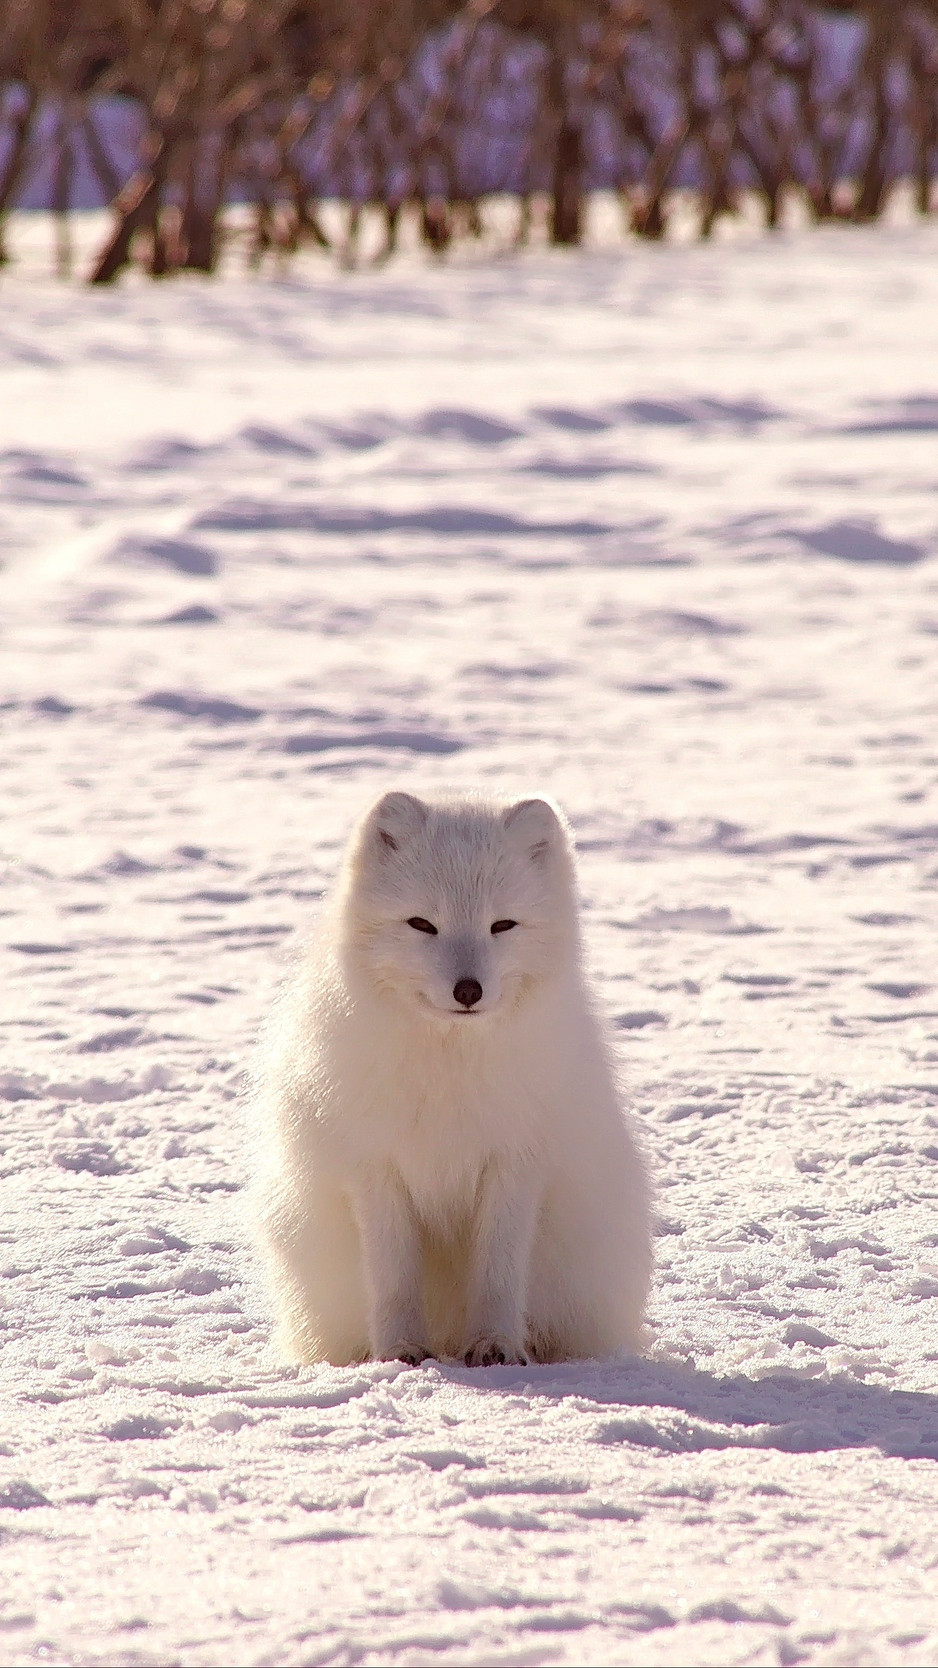 Wallpaper Polar Fox Arctic Fox Snow Iphone Arctic Fox Wallpaper Hd 938x1668 Wallpaper Teahub Io